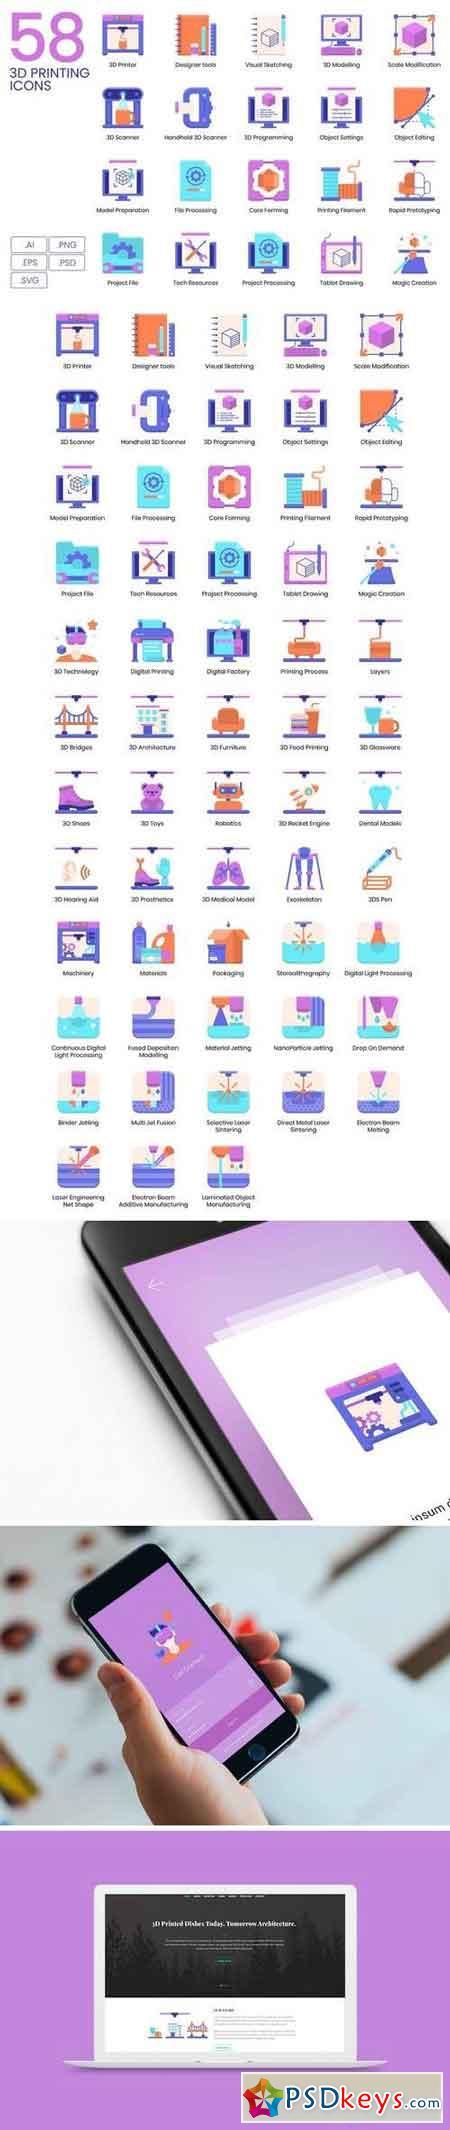 3D Printing Flat Icons